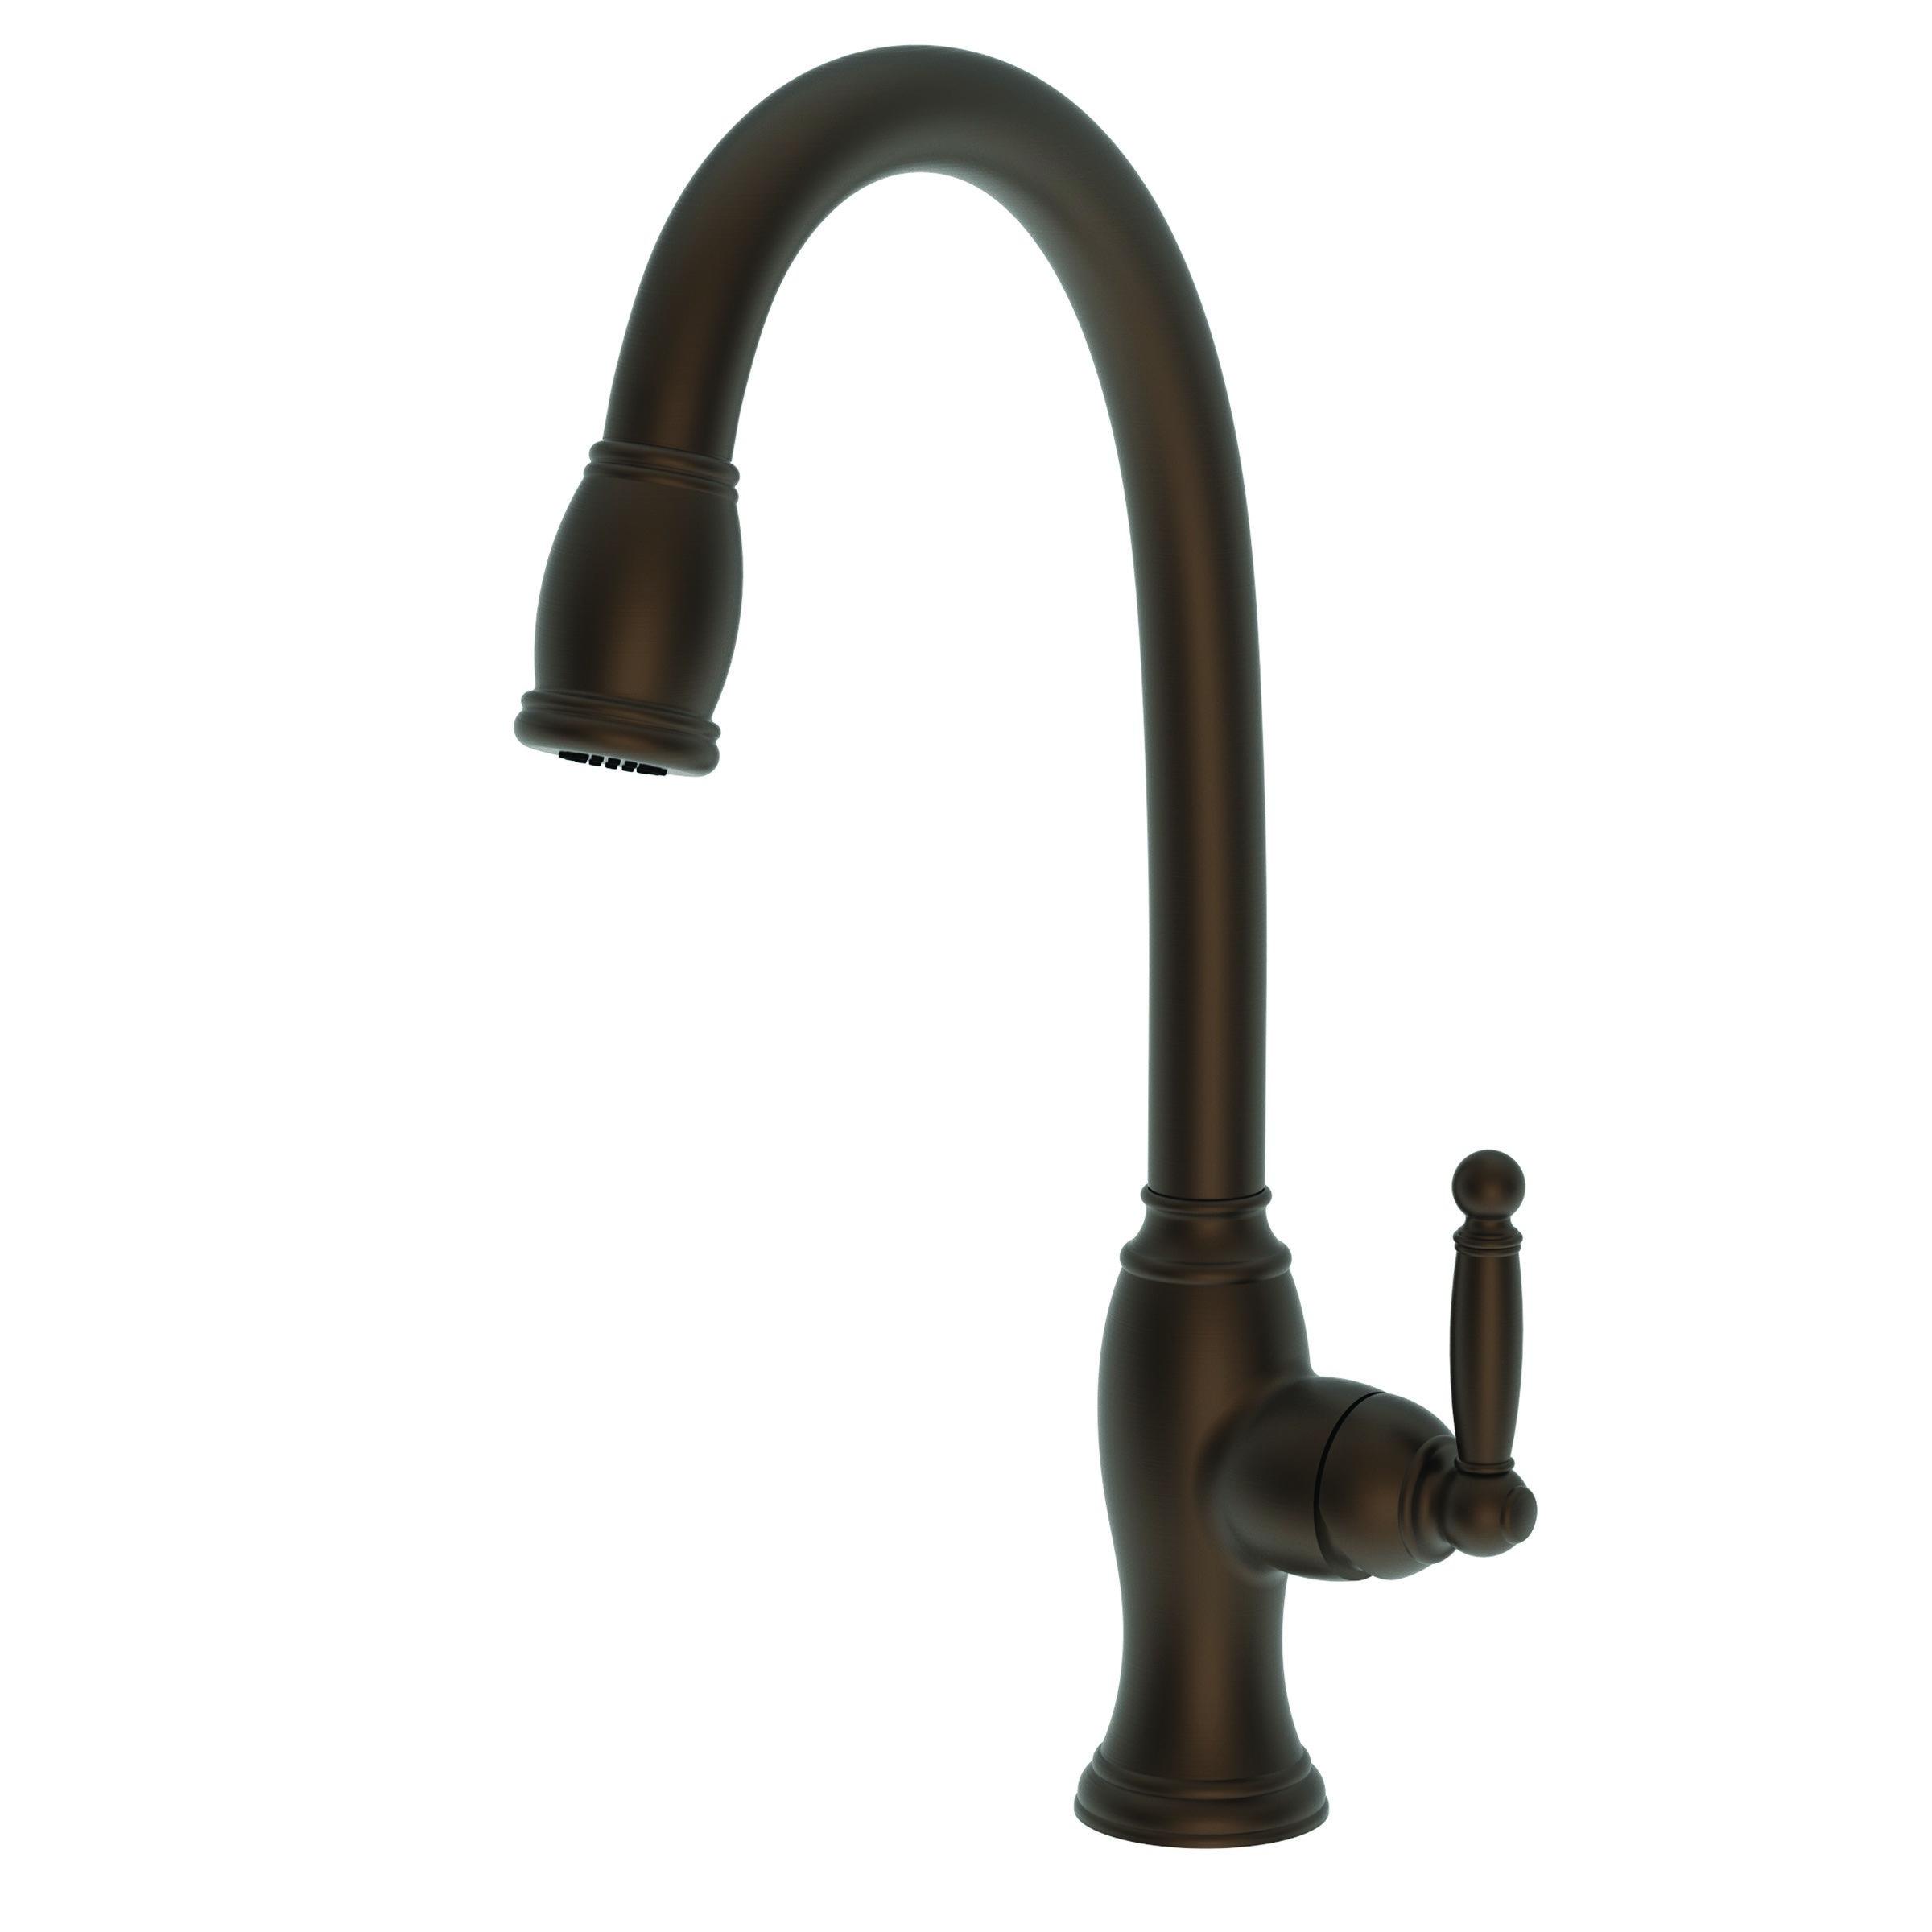 Newport Brass 2510-5103 Pull-down Kitchen Faucet